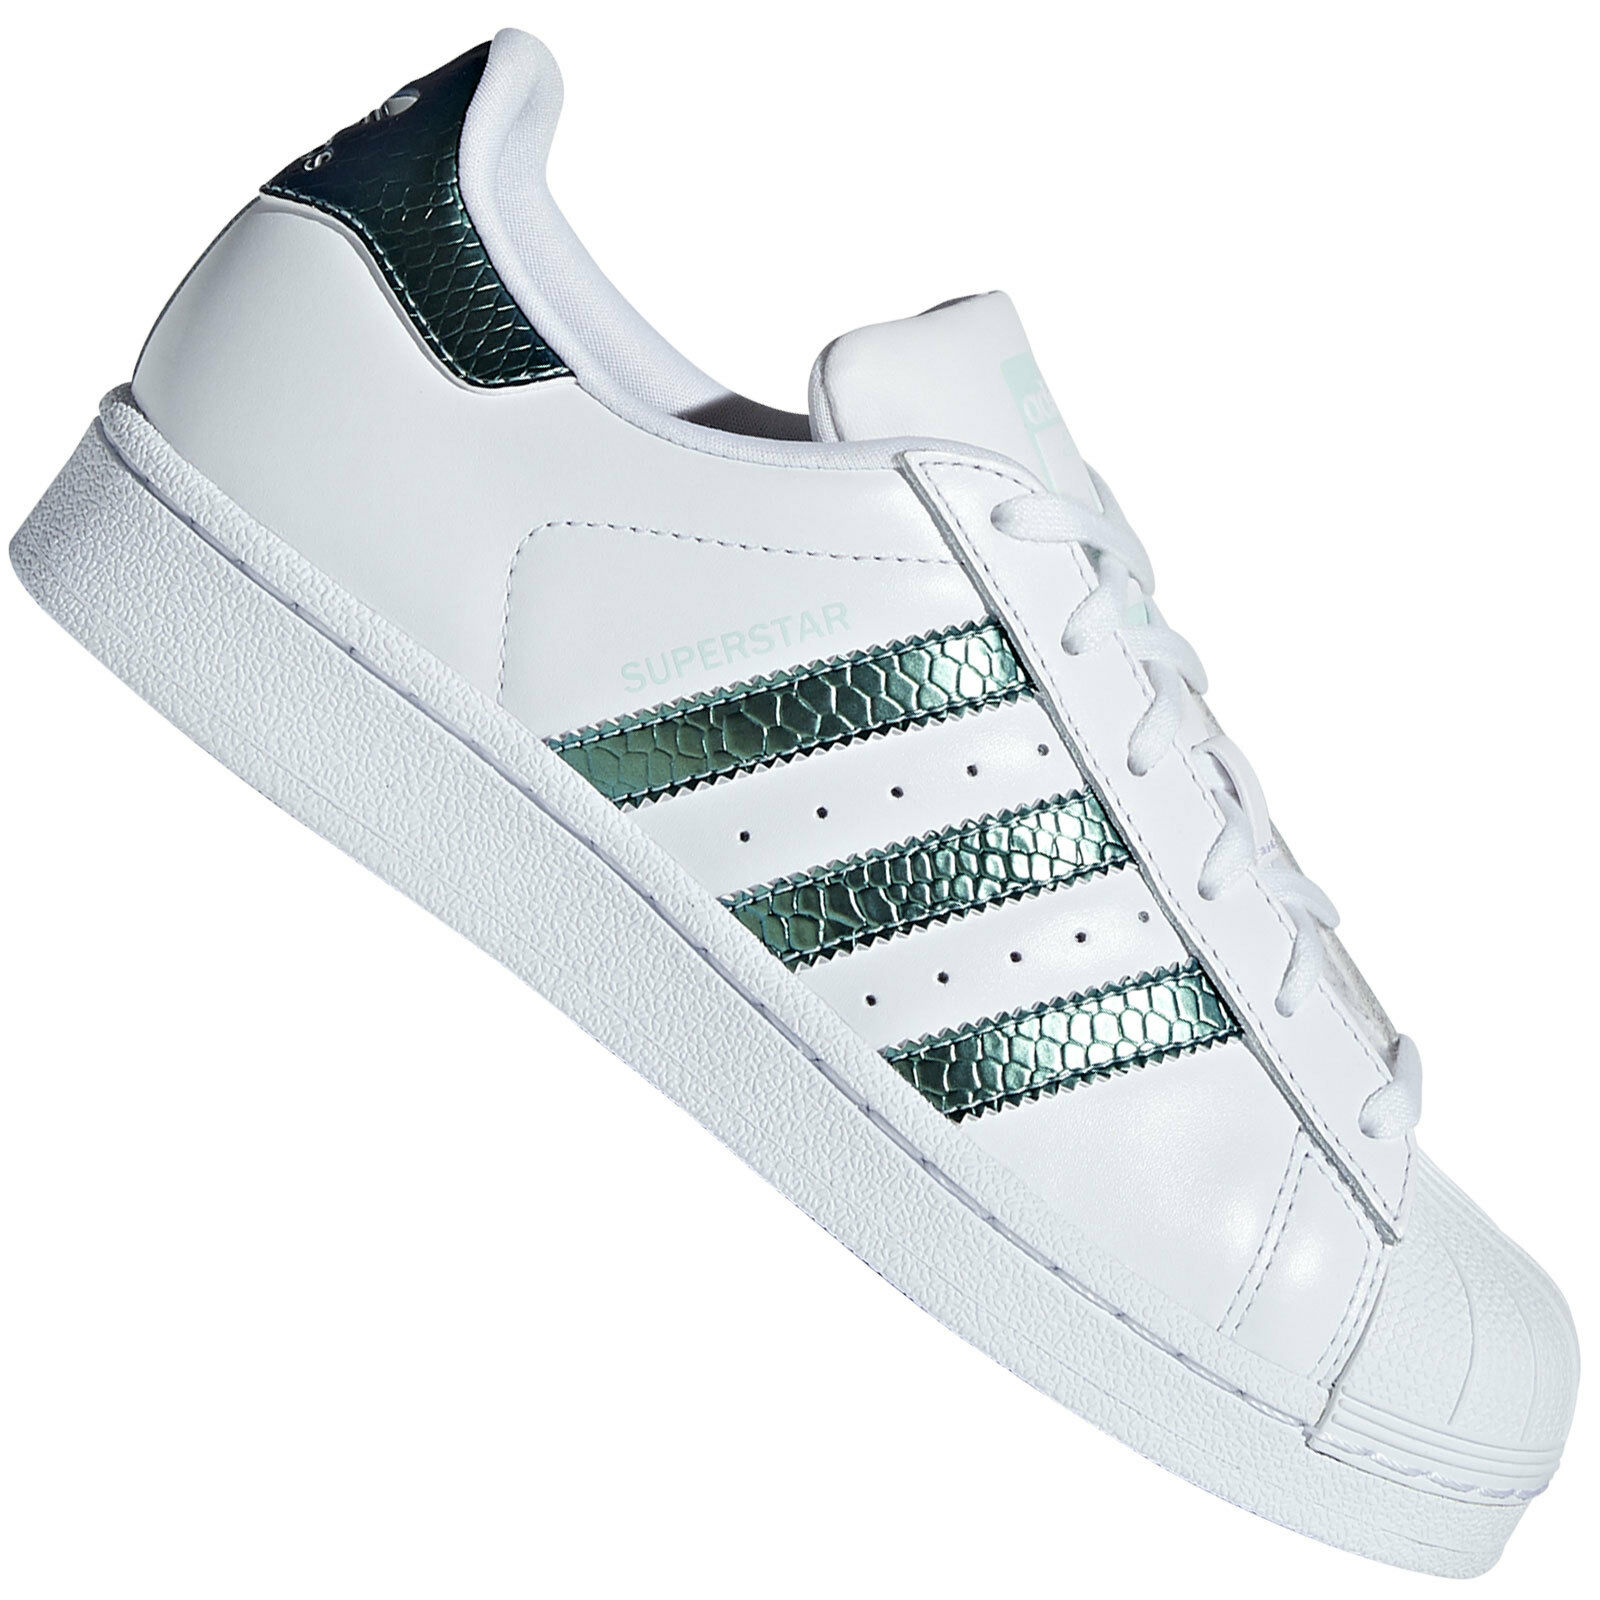 Adidas Originals Superstar Junior Enfants Turnchaussures femmes chaussures Lueur Metallic